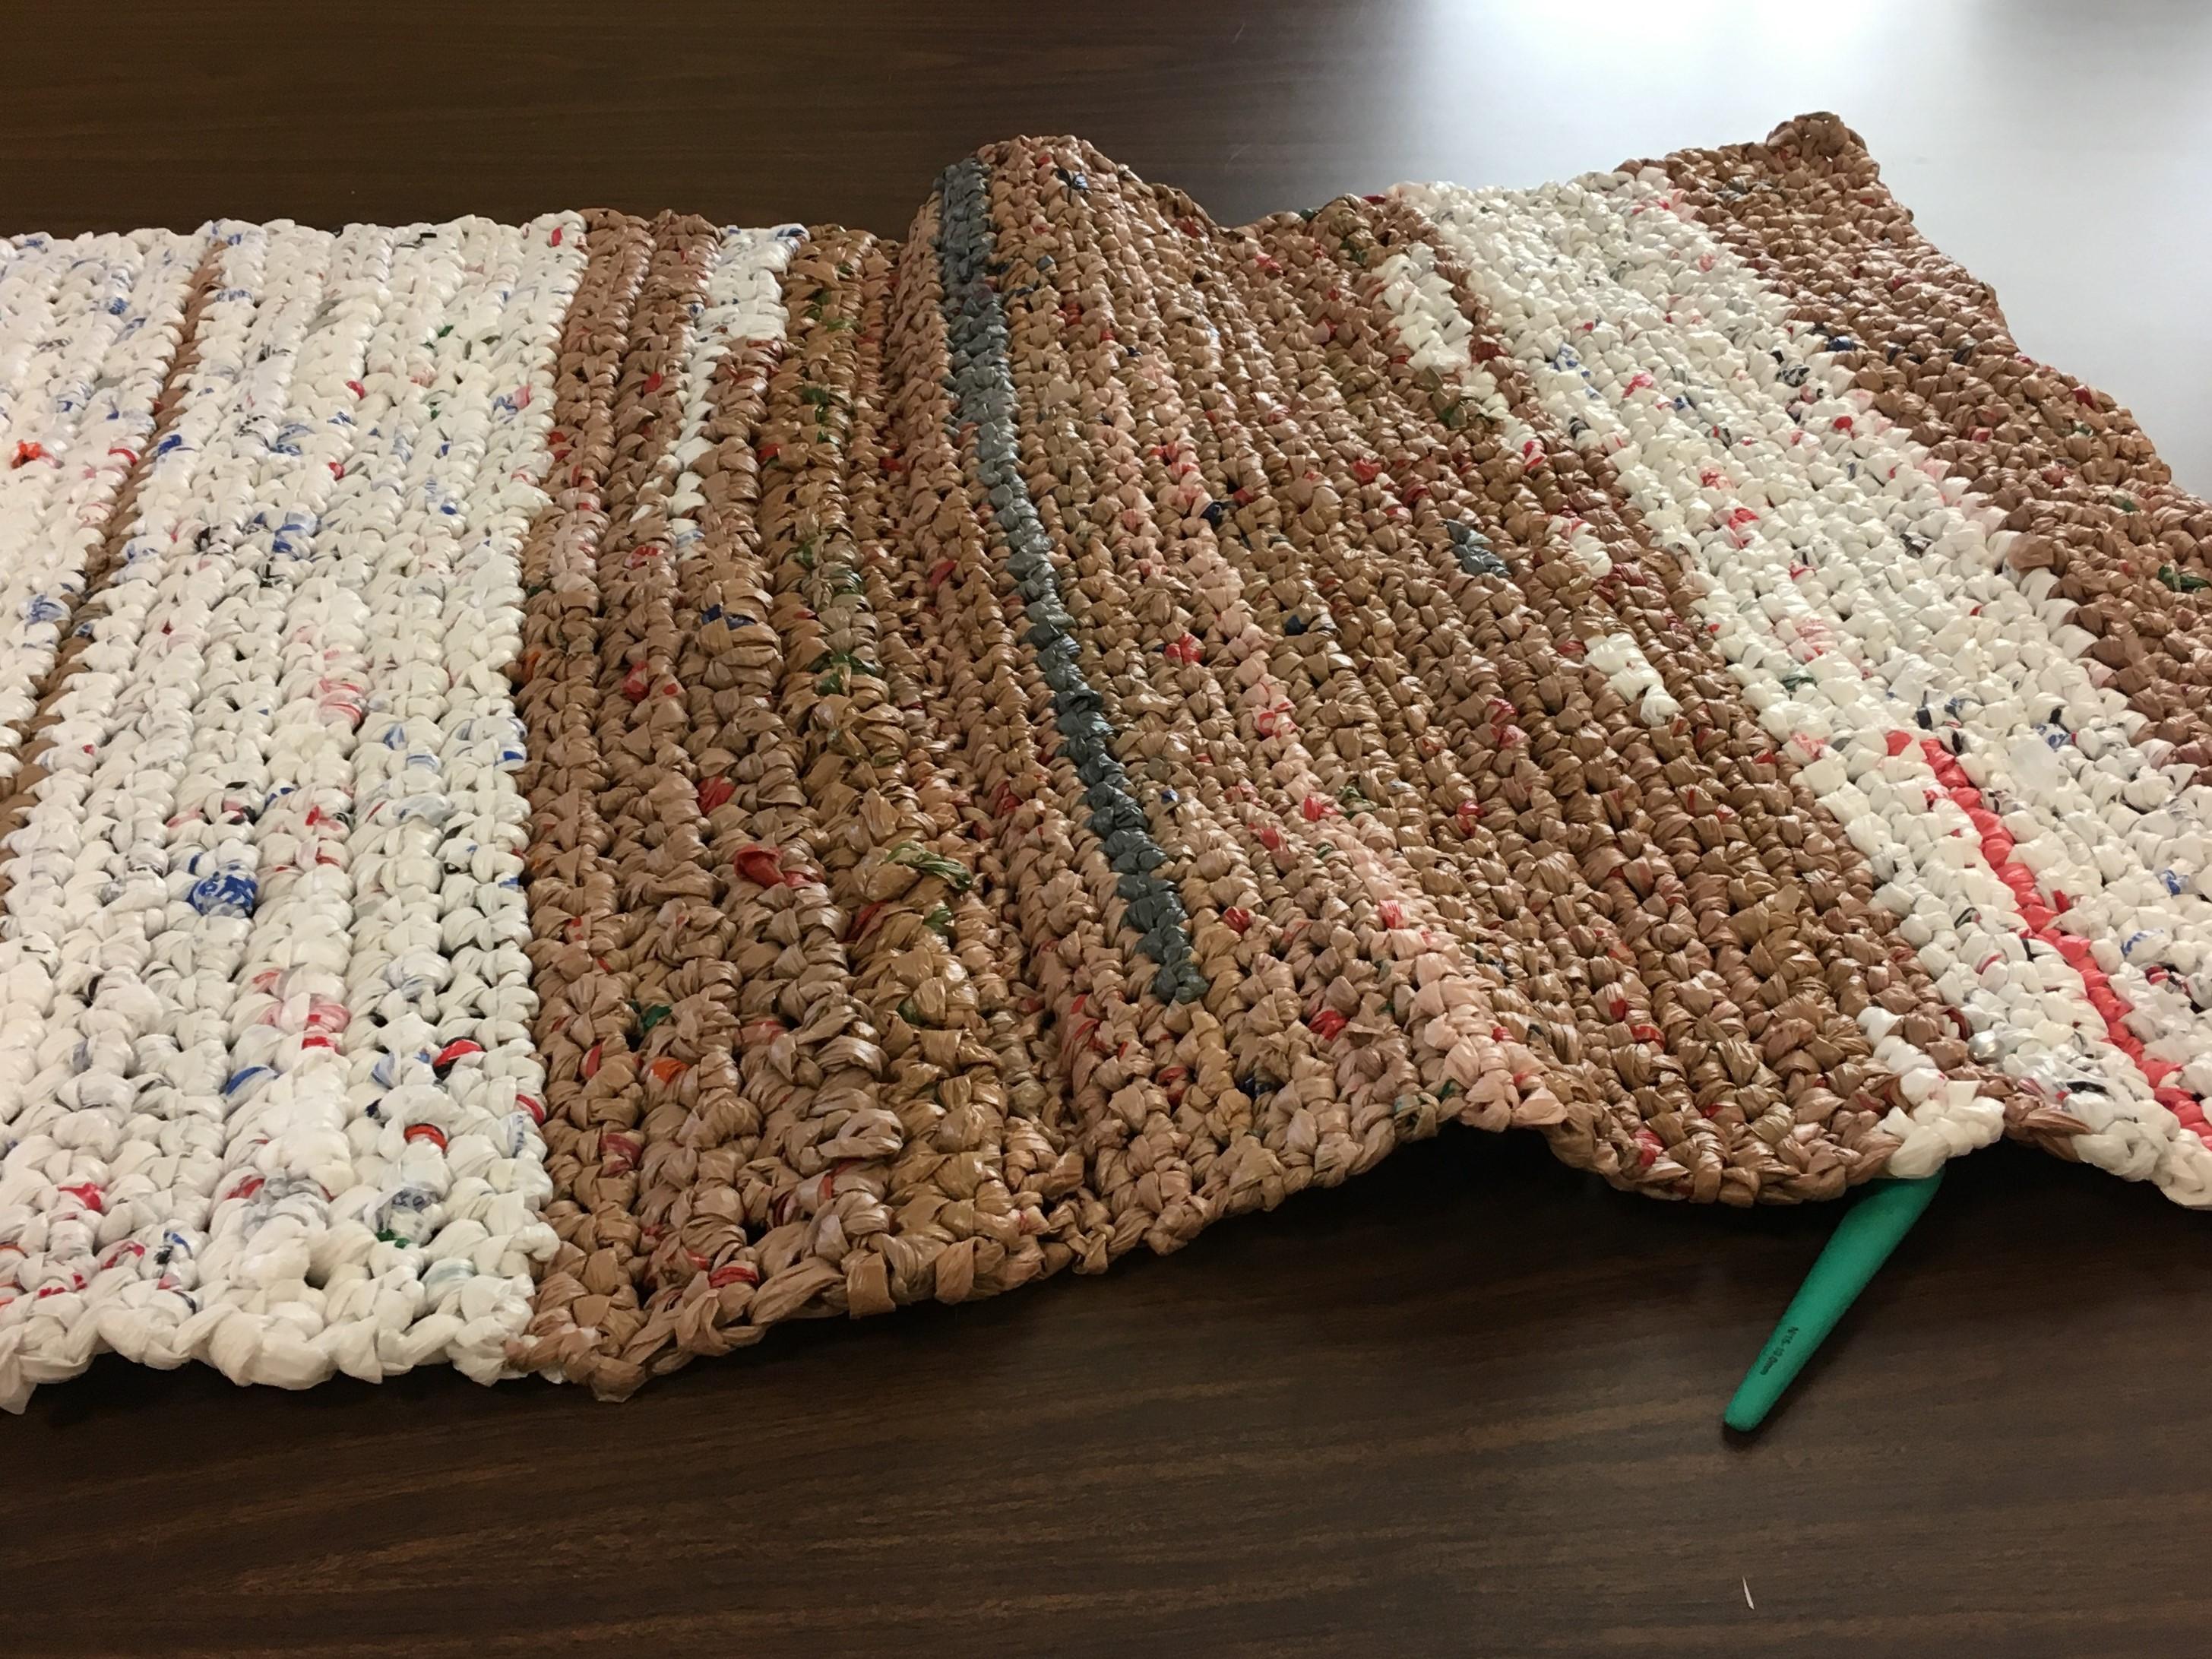 Volunteer in Mesa AZ - making sleeping mats for the homeless